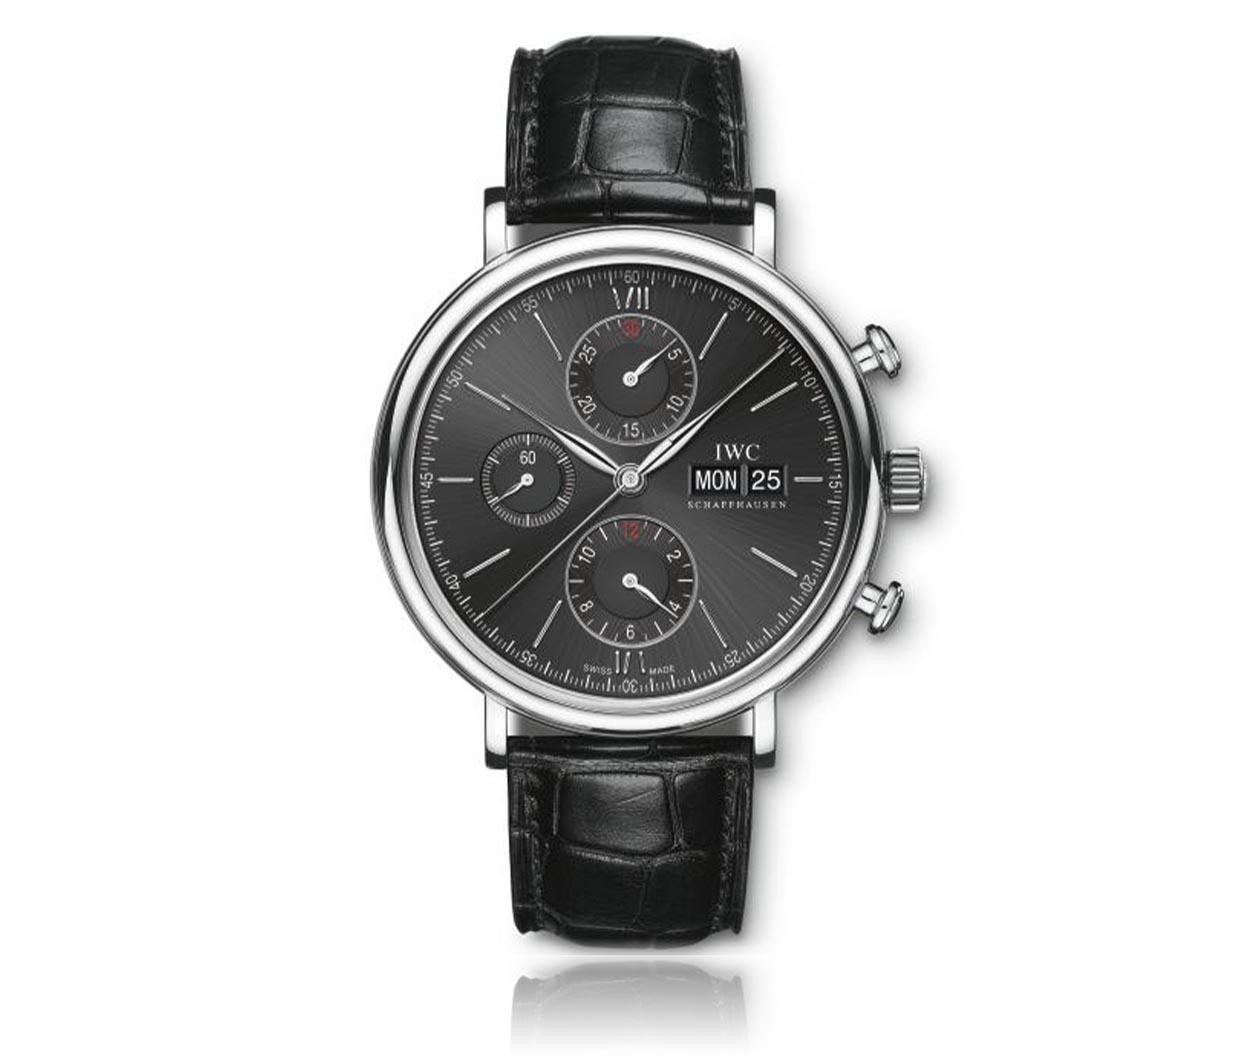 IWC Portofino Chronograph IW391029 Carousel 1 FINAL